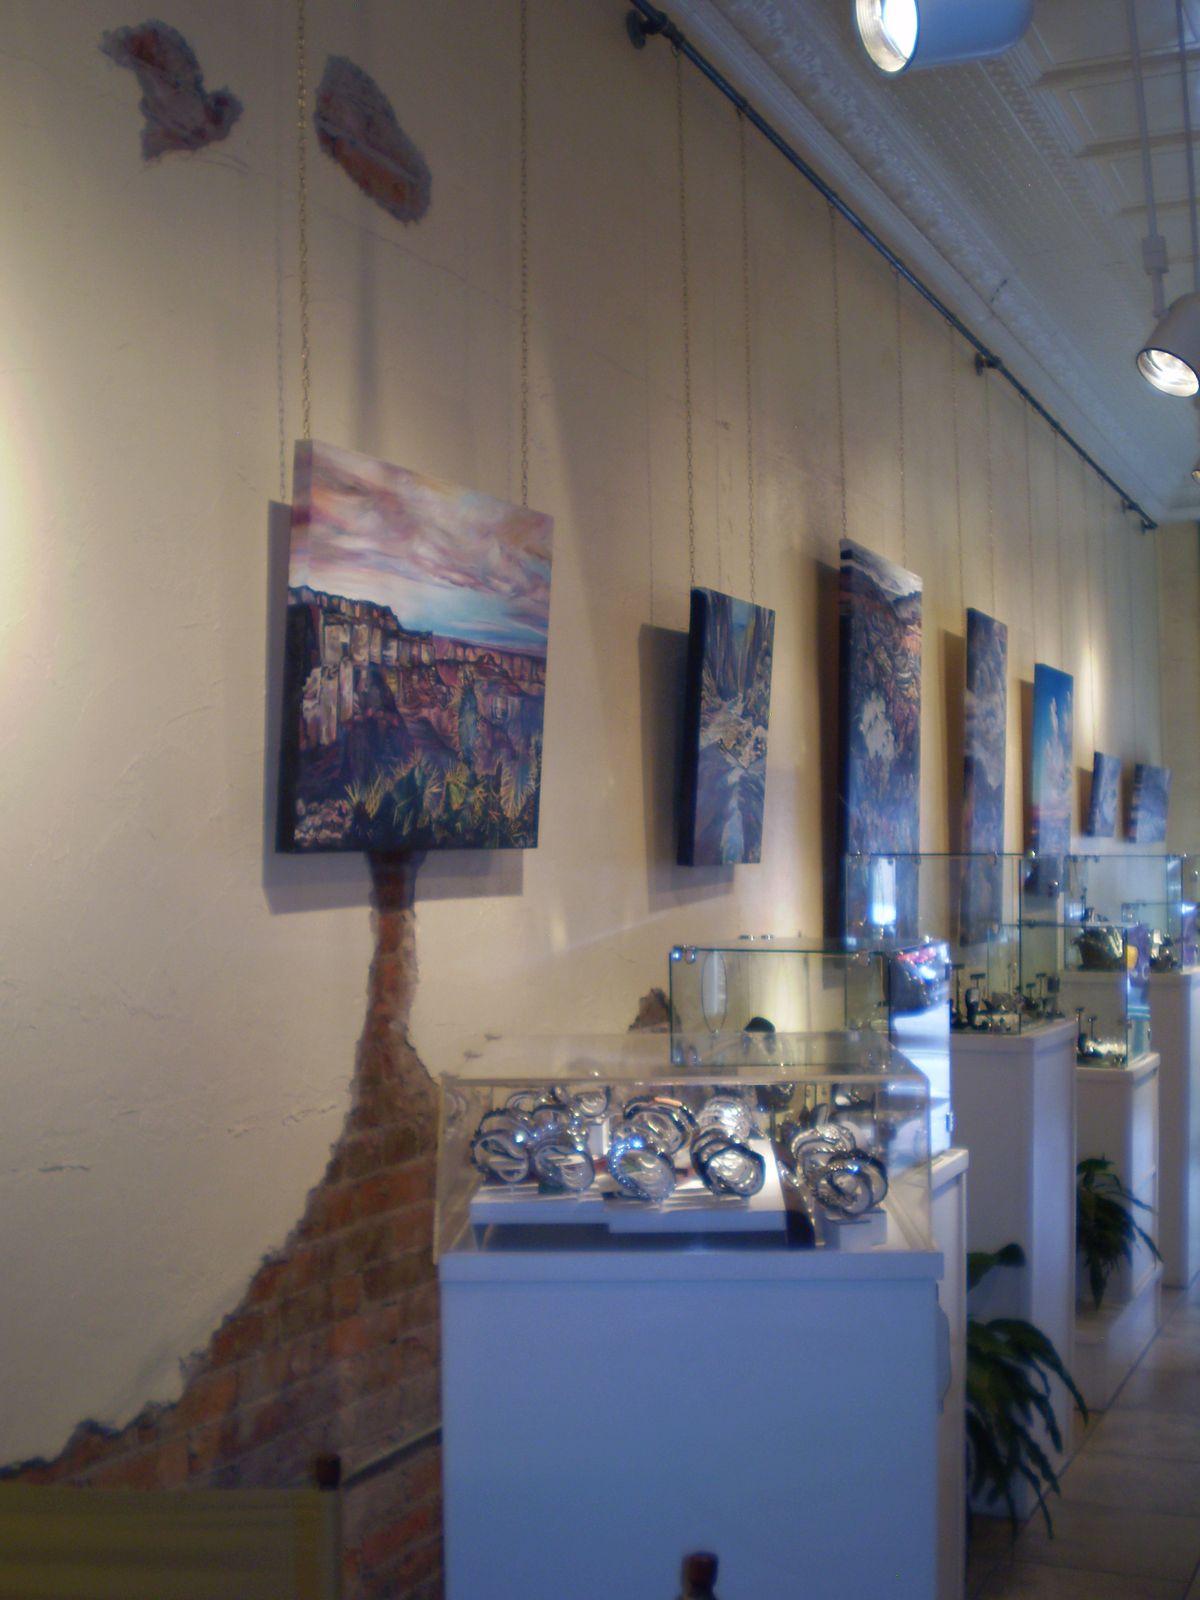 Will Mcnabb gallery, Flagstaff Arizona